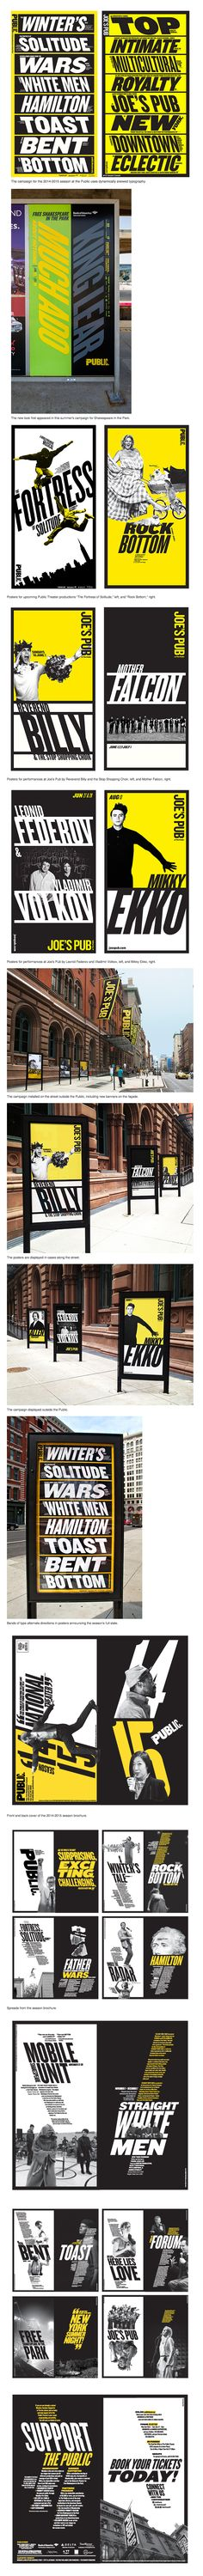 campaign typography Paula Scher / Pentagram - The Public Theater Branding And Packaging, Branding Design, Logo Design, Paula Scher, Typography Layout, Typography Poster, Graphic Artwork, Graphic Design Art, Schrift Design